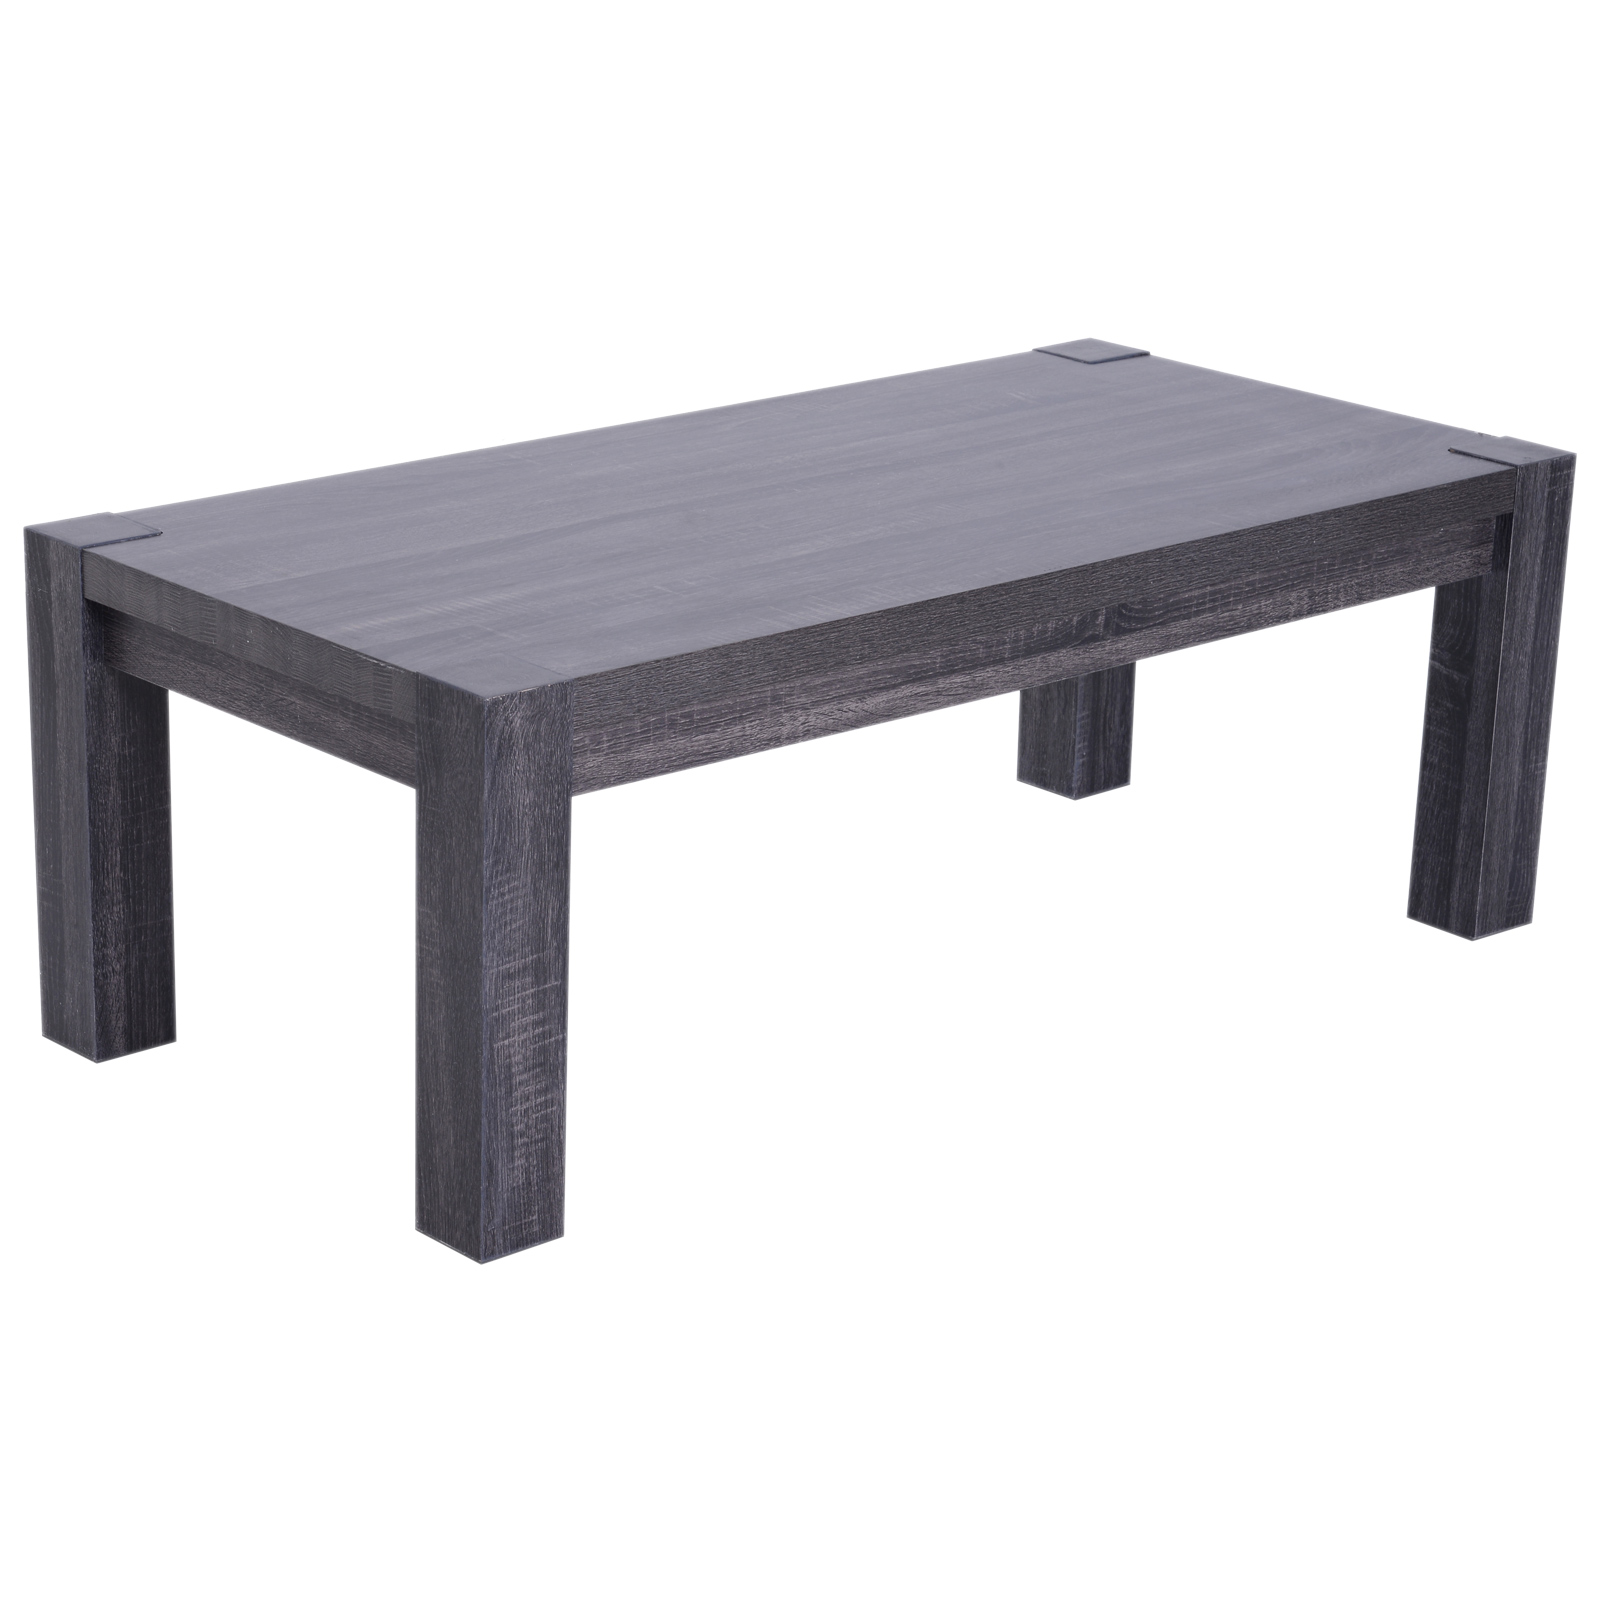 HOMCOM Coffee Table Modern Design Living Room Living Room Wood 120x59x45 Cm Black